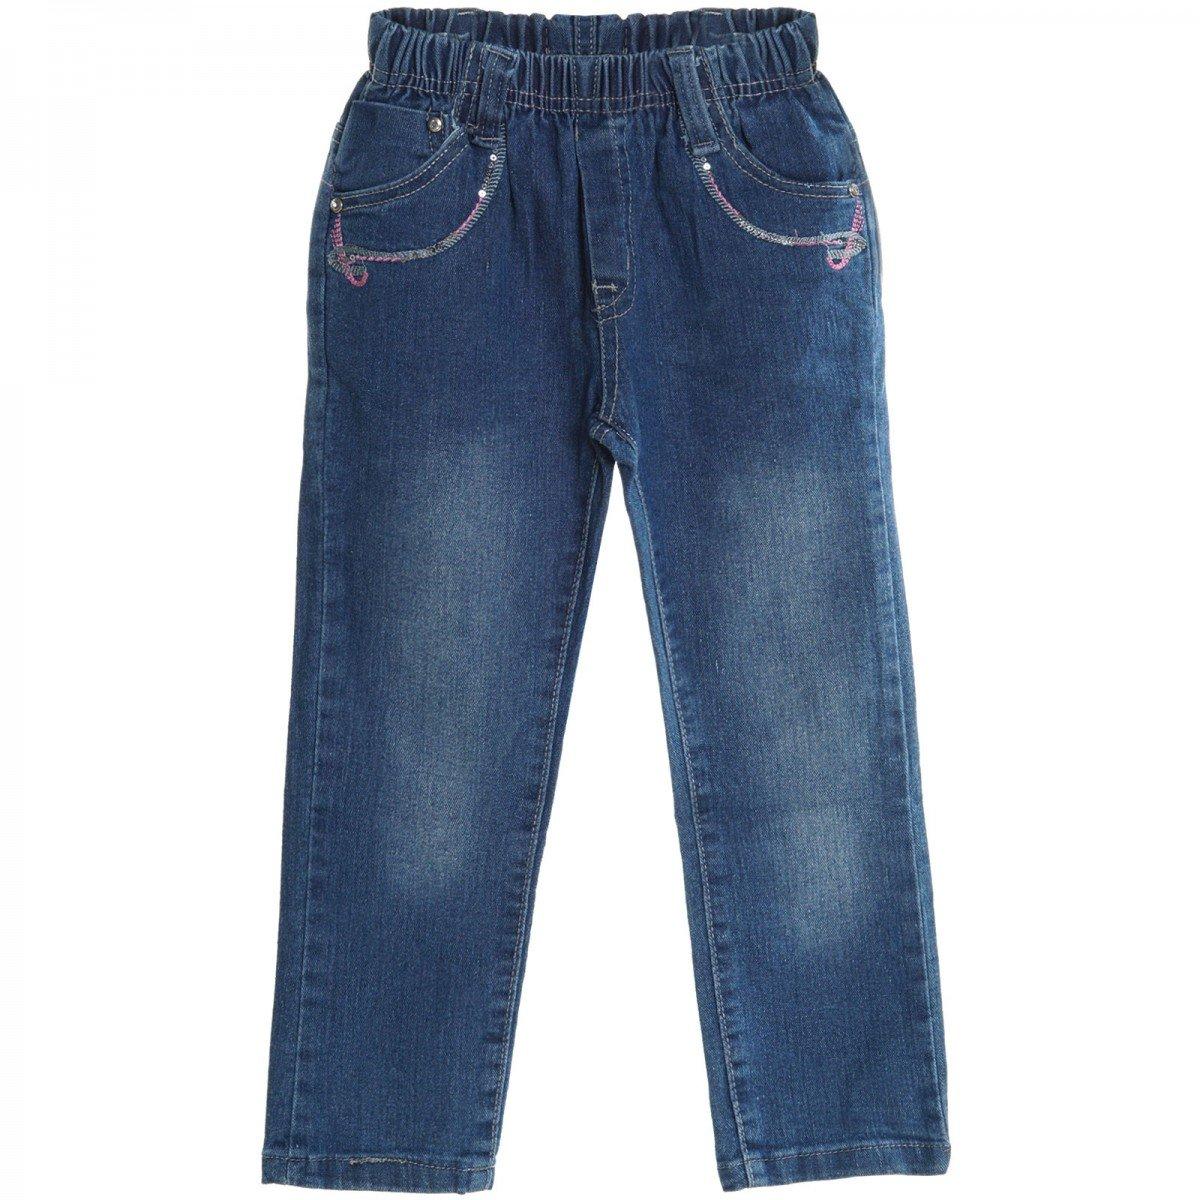 BEZLIT Baby Girls' Skinny Plain Jeans 20503